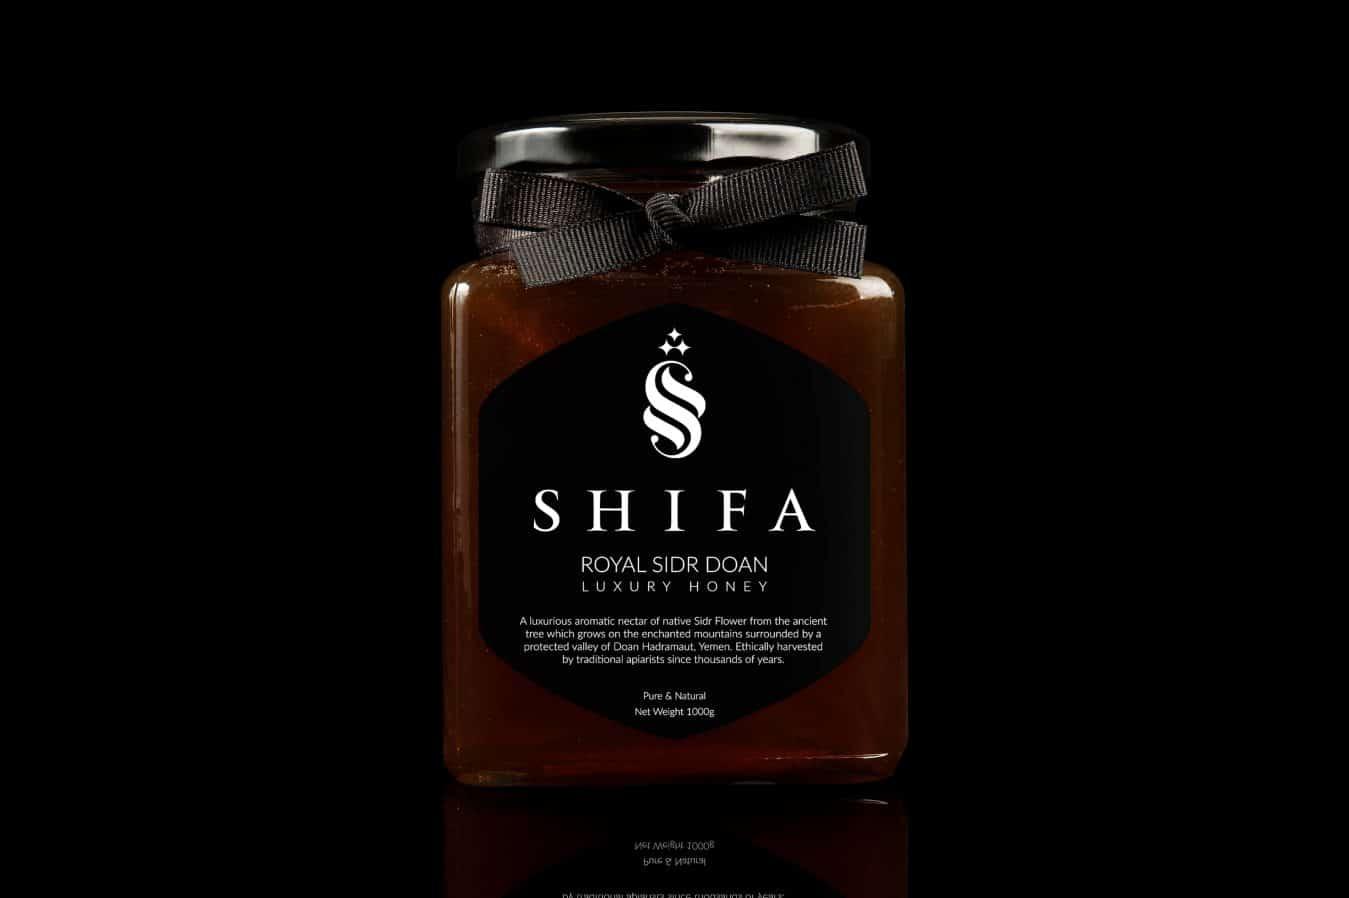 Shifa Royal Sidr Doan Honey - 2